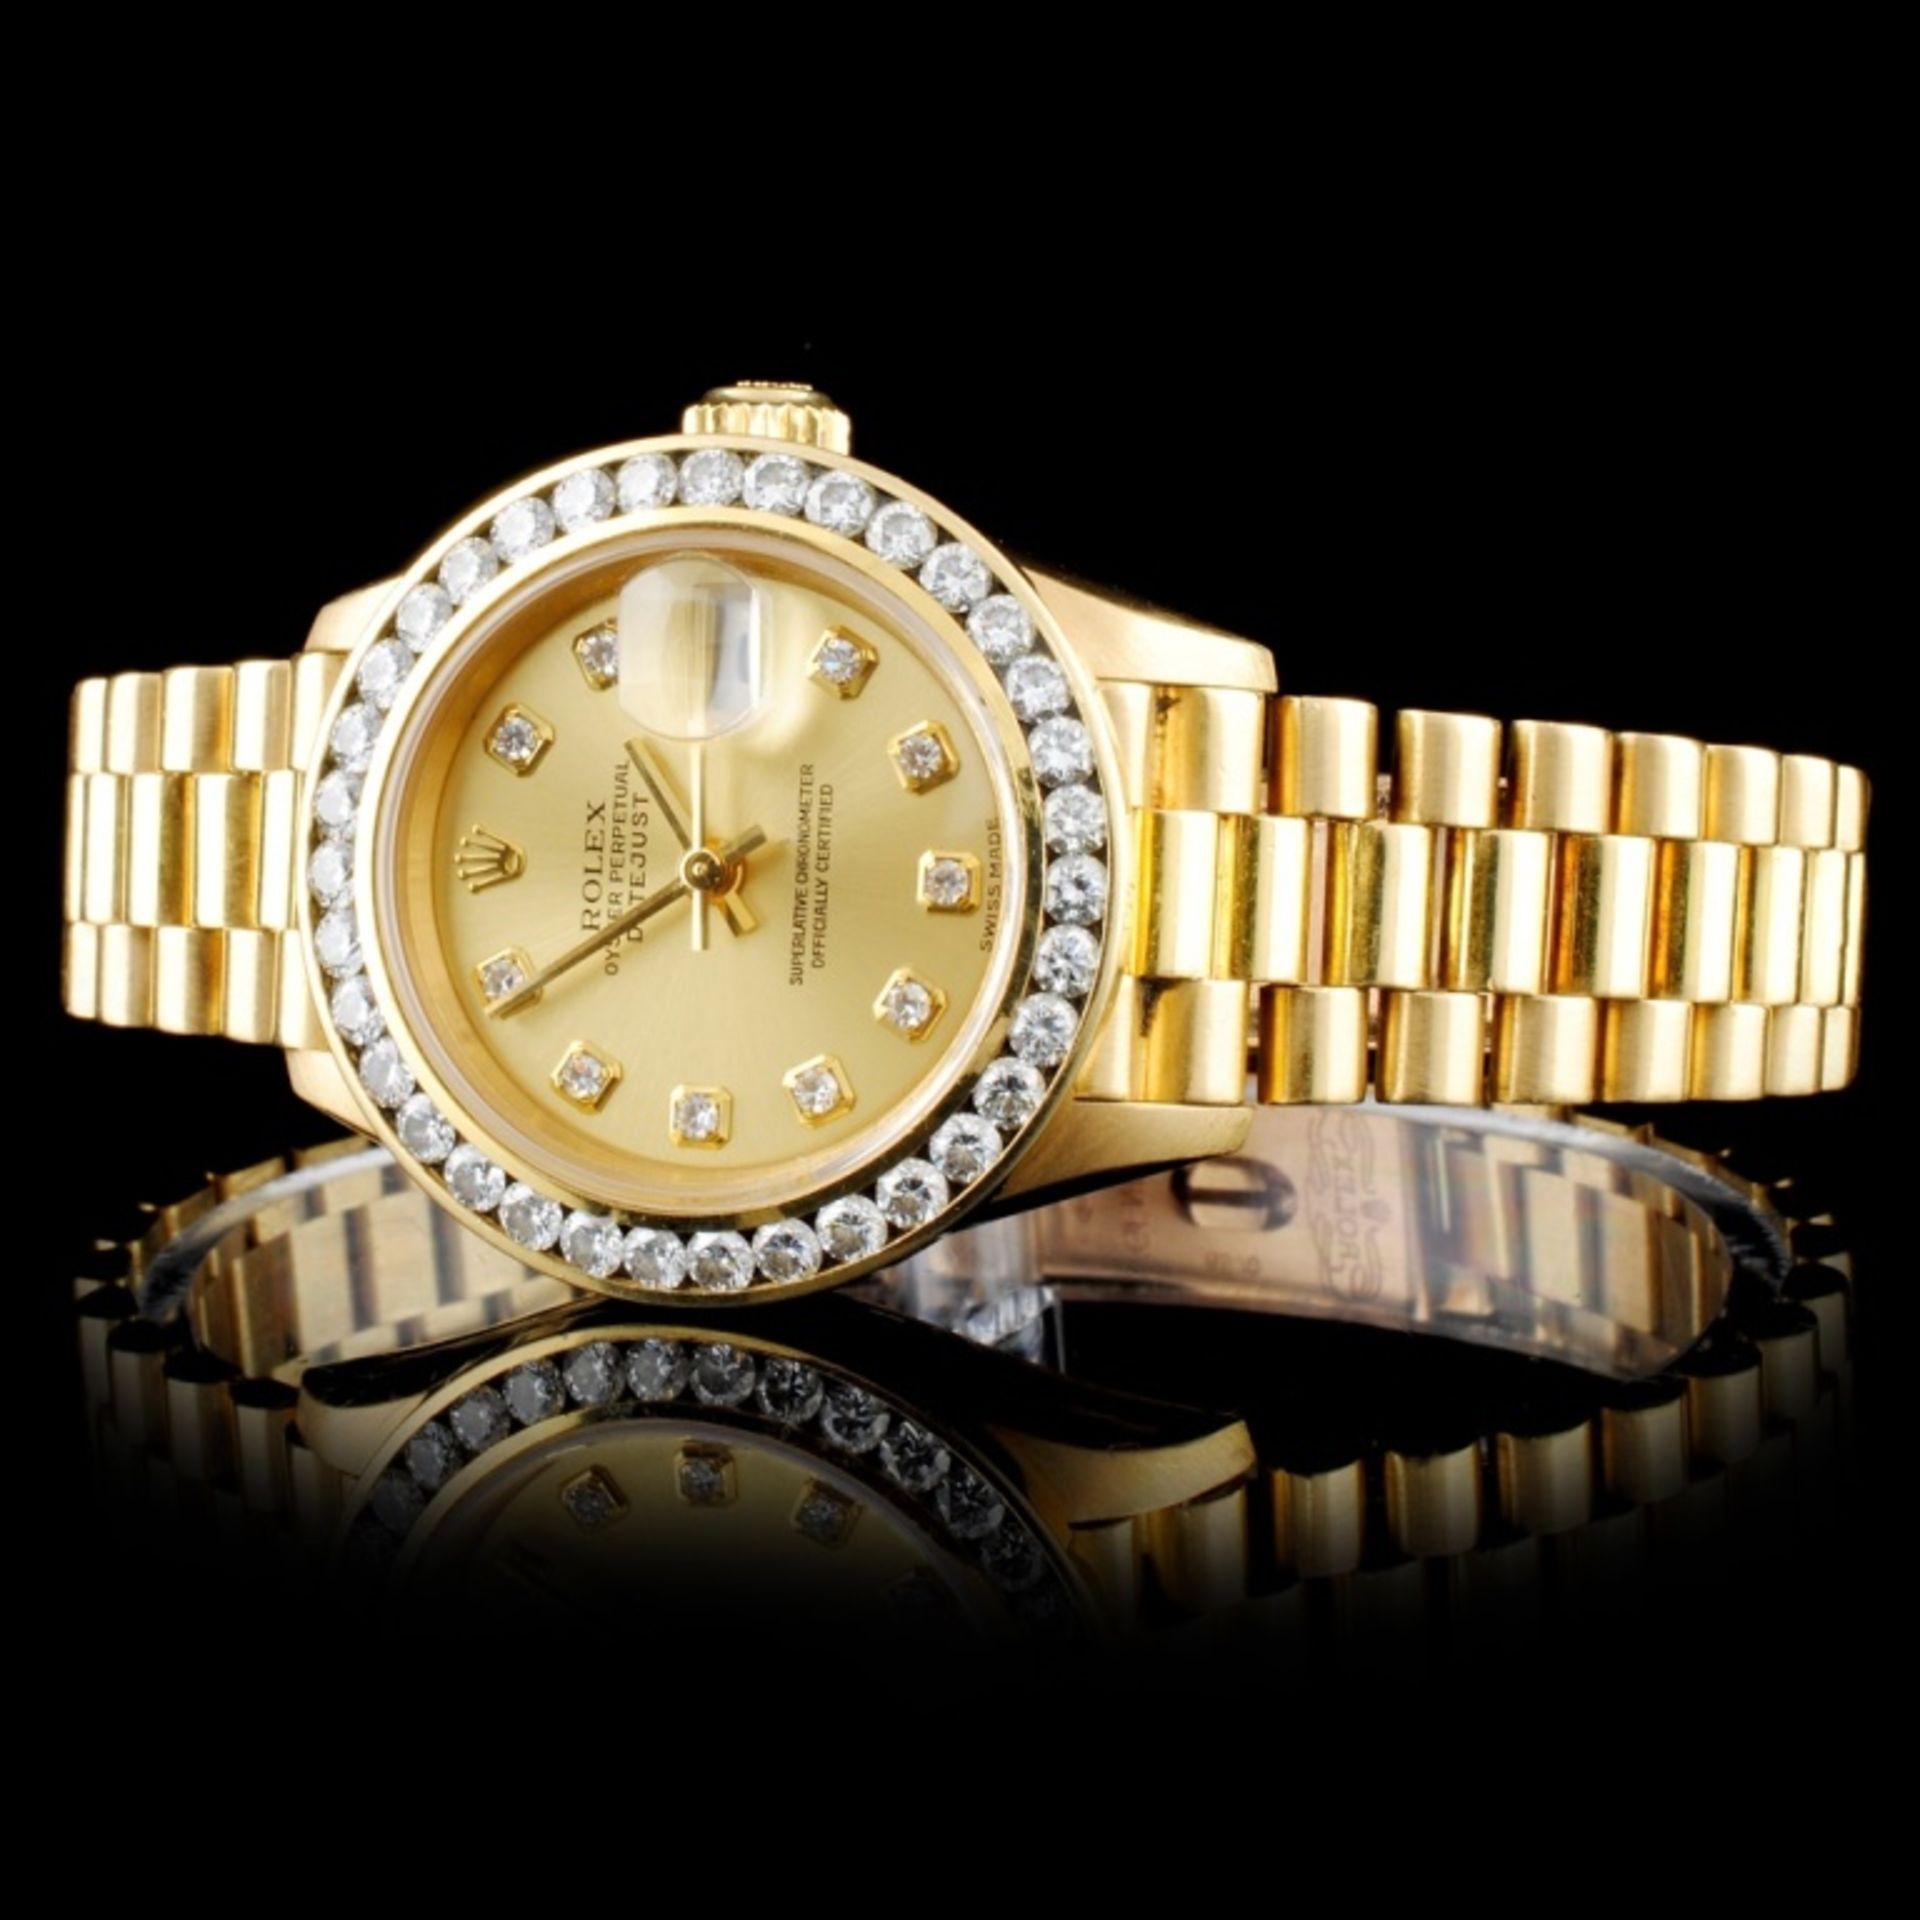 Rolex Presidential Diamond Ladies Watch - Image 2 of 5